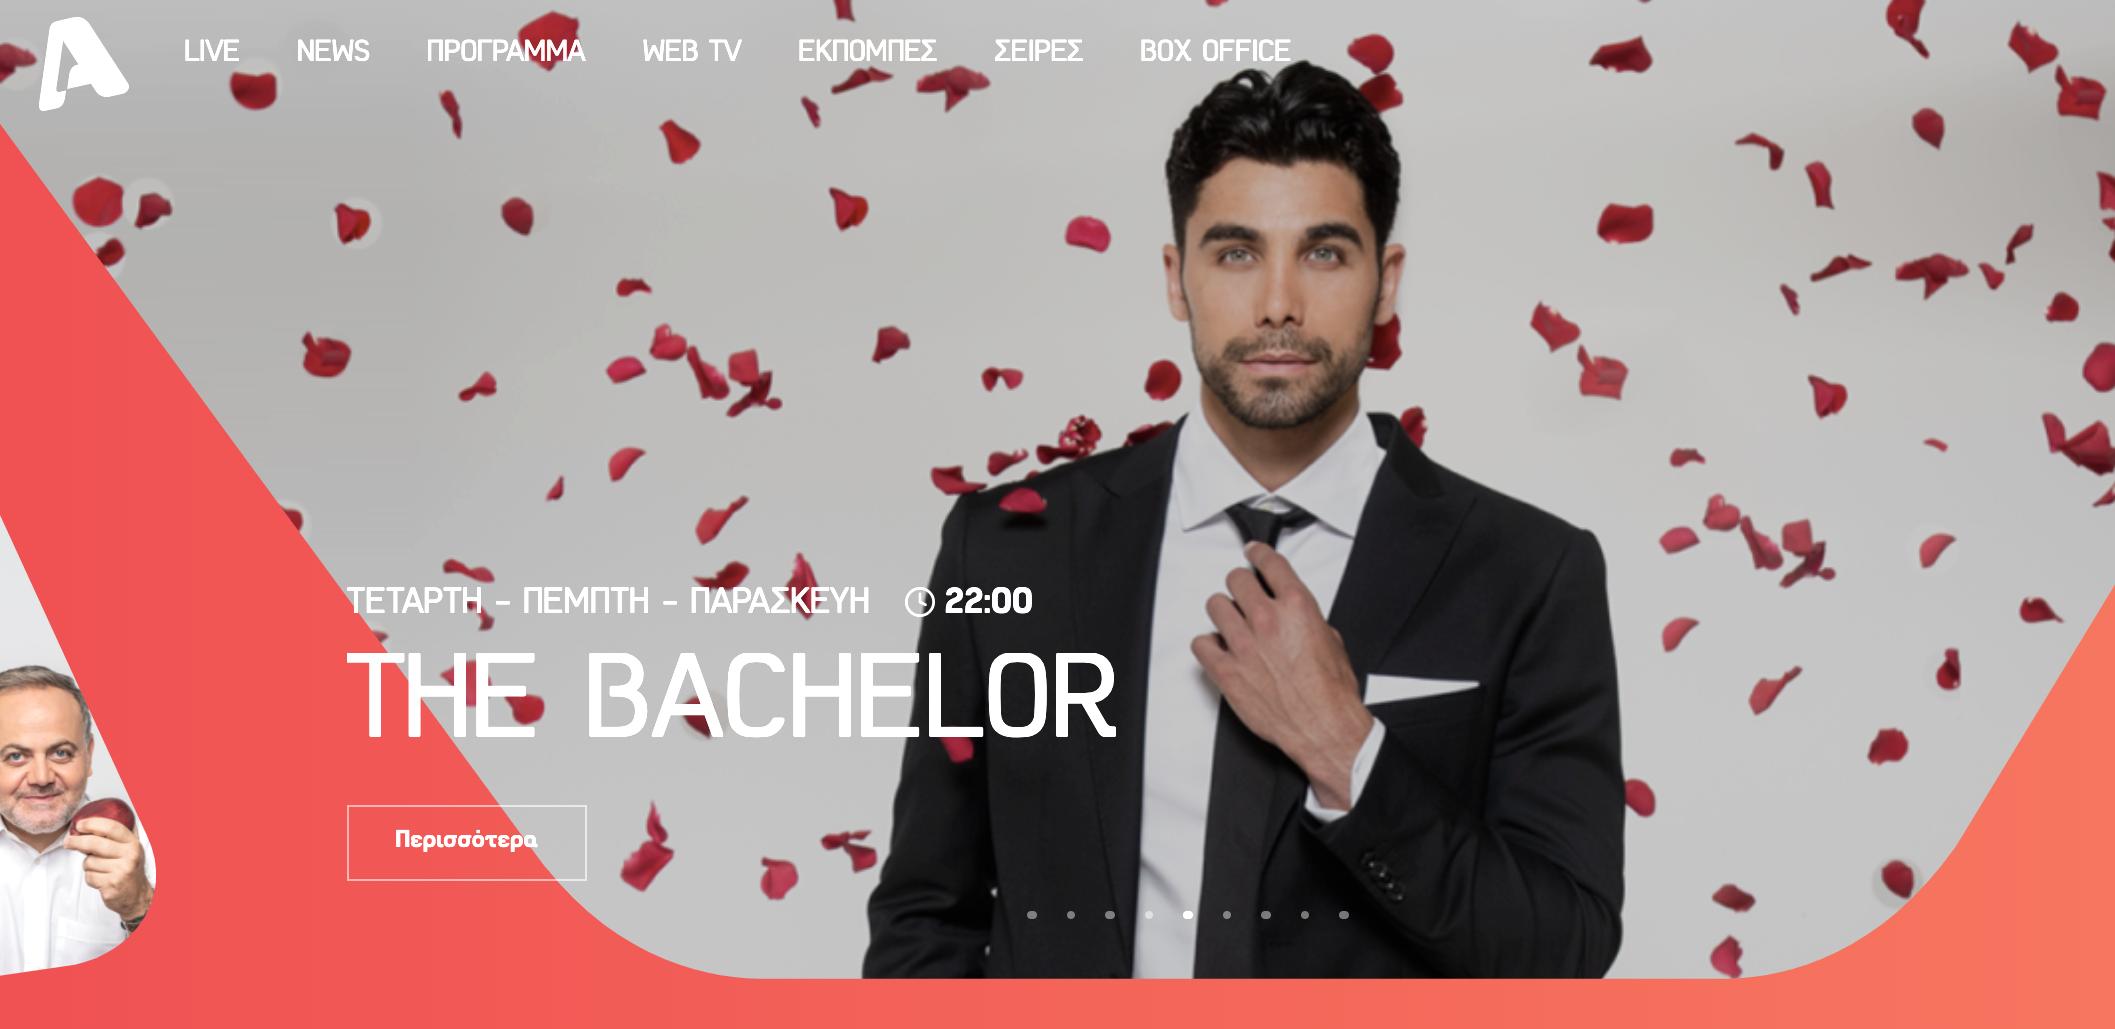 «The Bachelor»: Αλλάζουν ξανά οι ημέρες προβολής